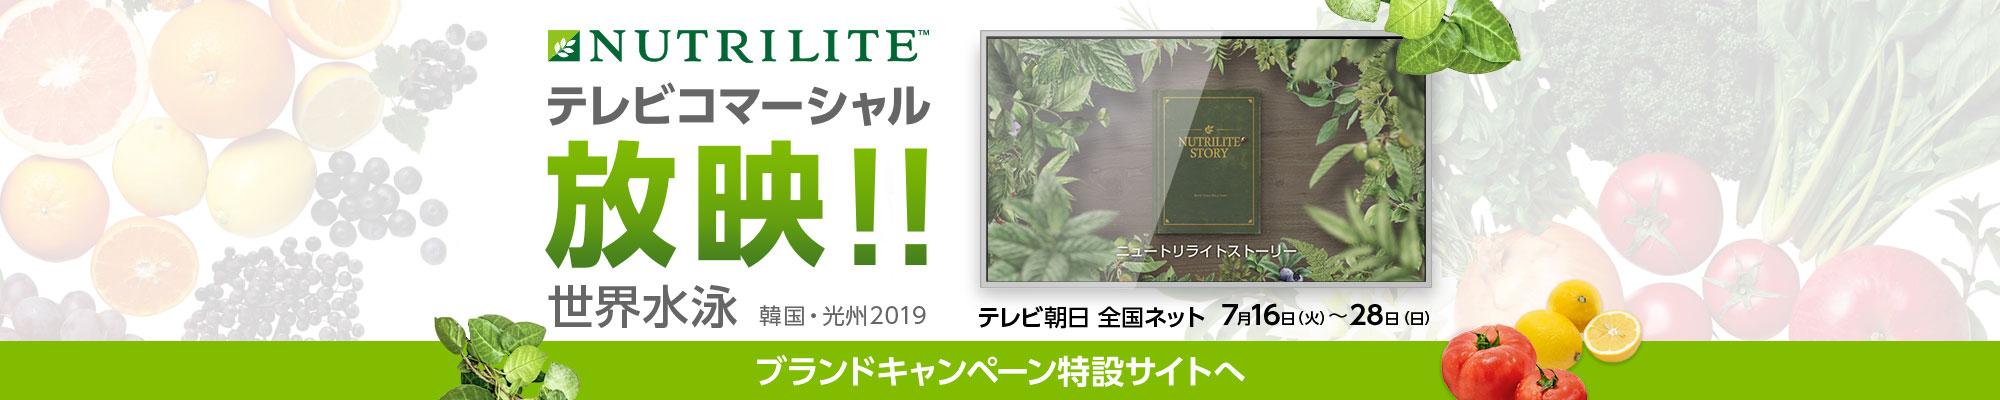 NUTRILITEテレビコマーシャル放映!!